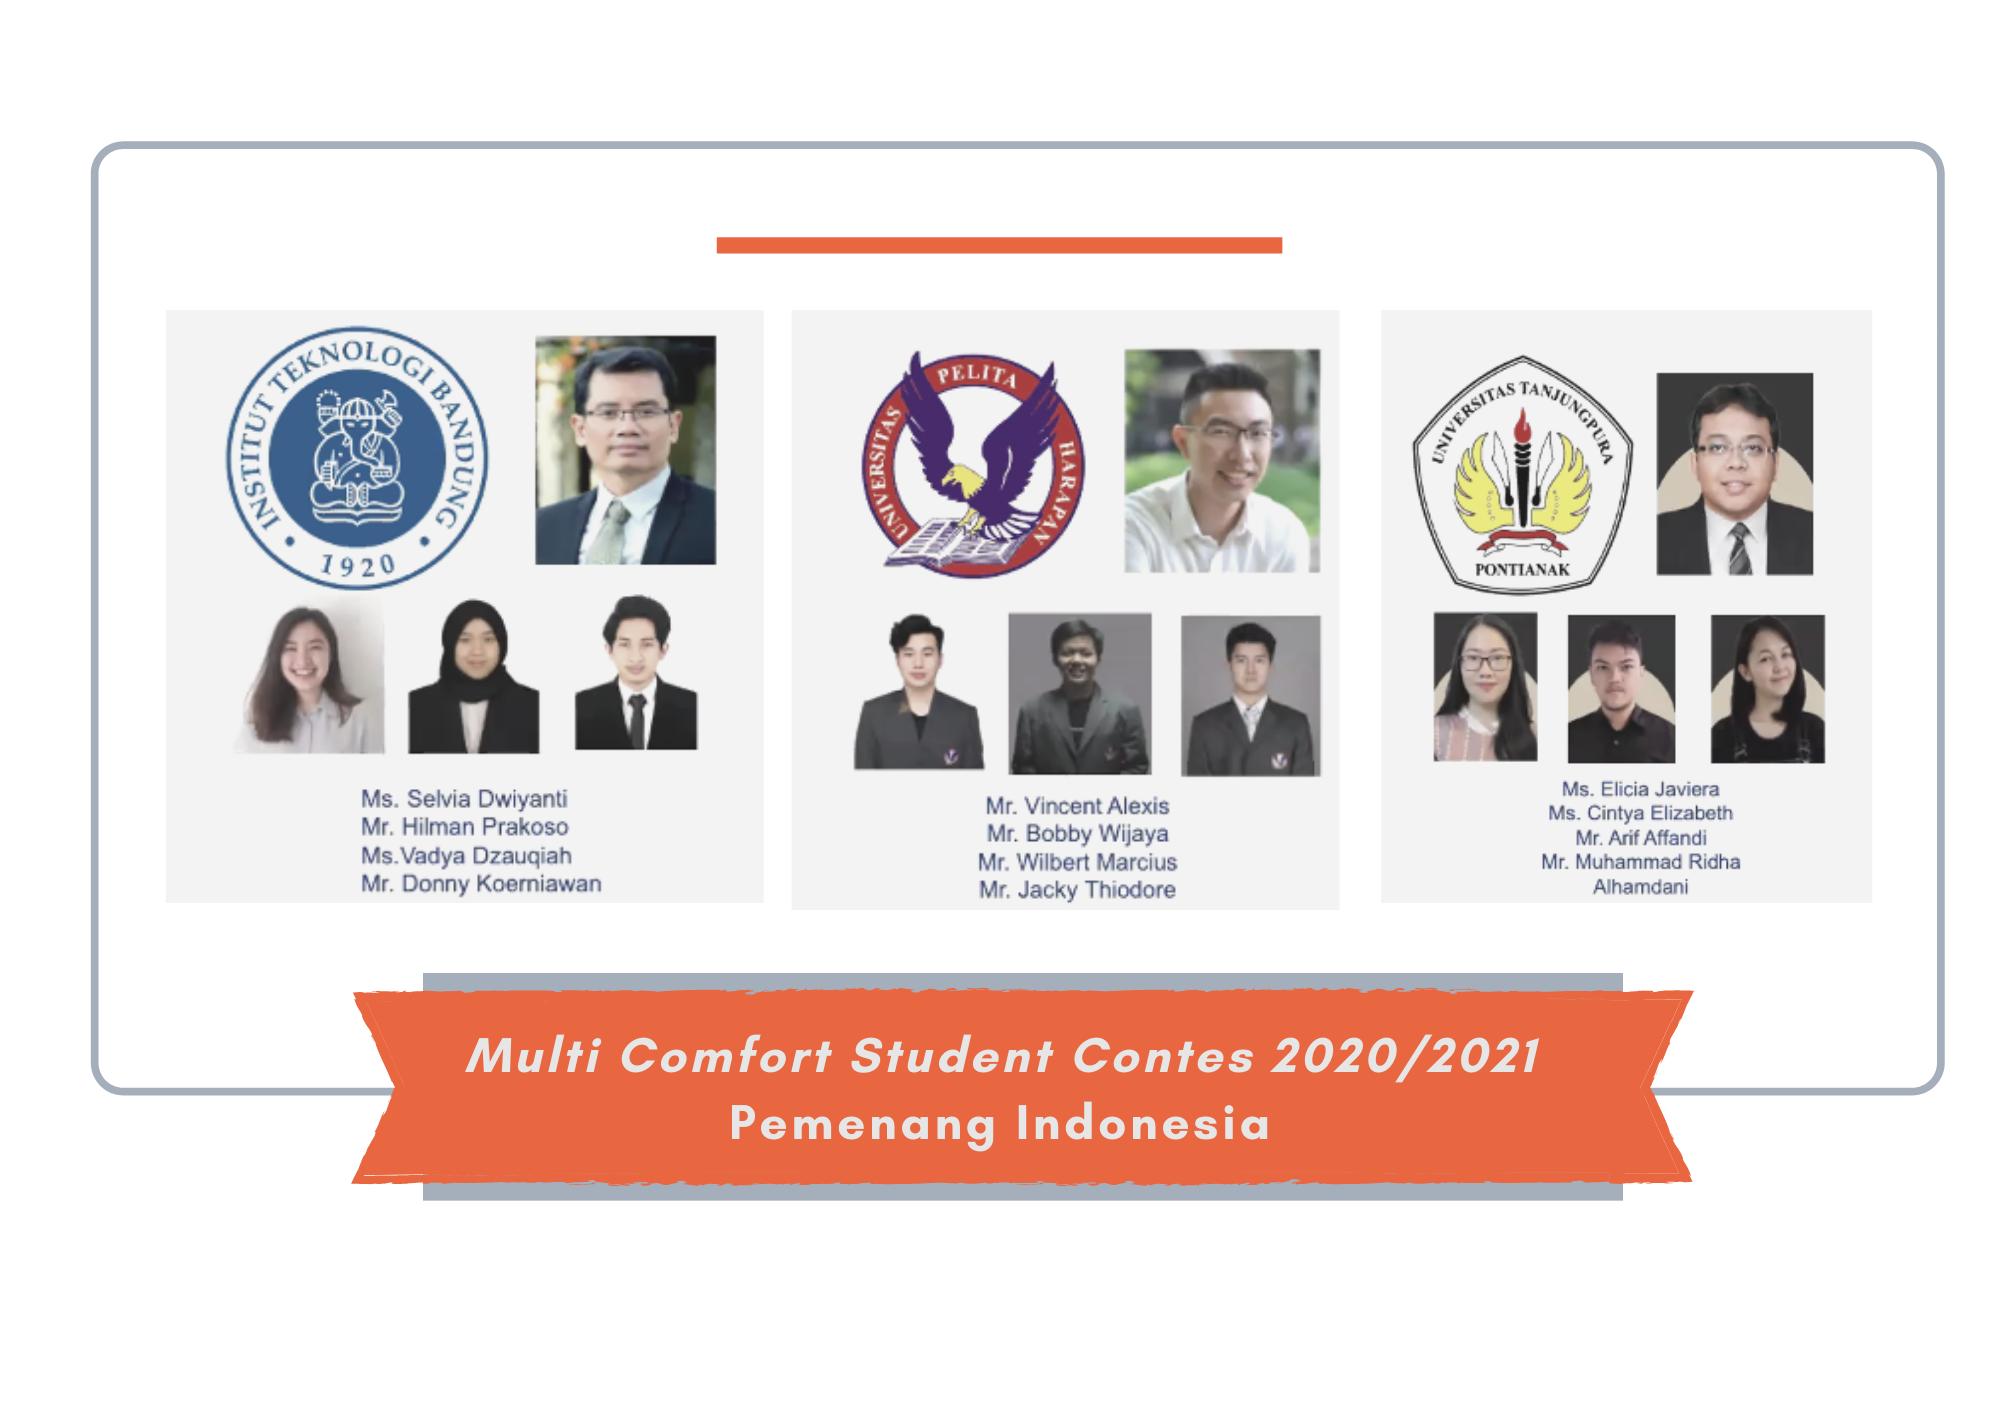 pemenang multi confort student contest 2020/2021